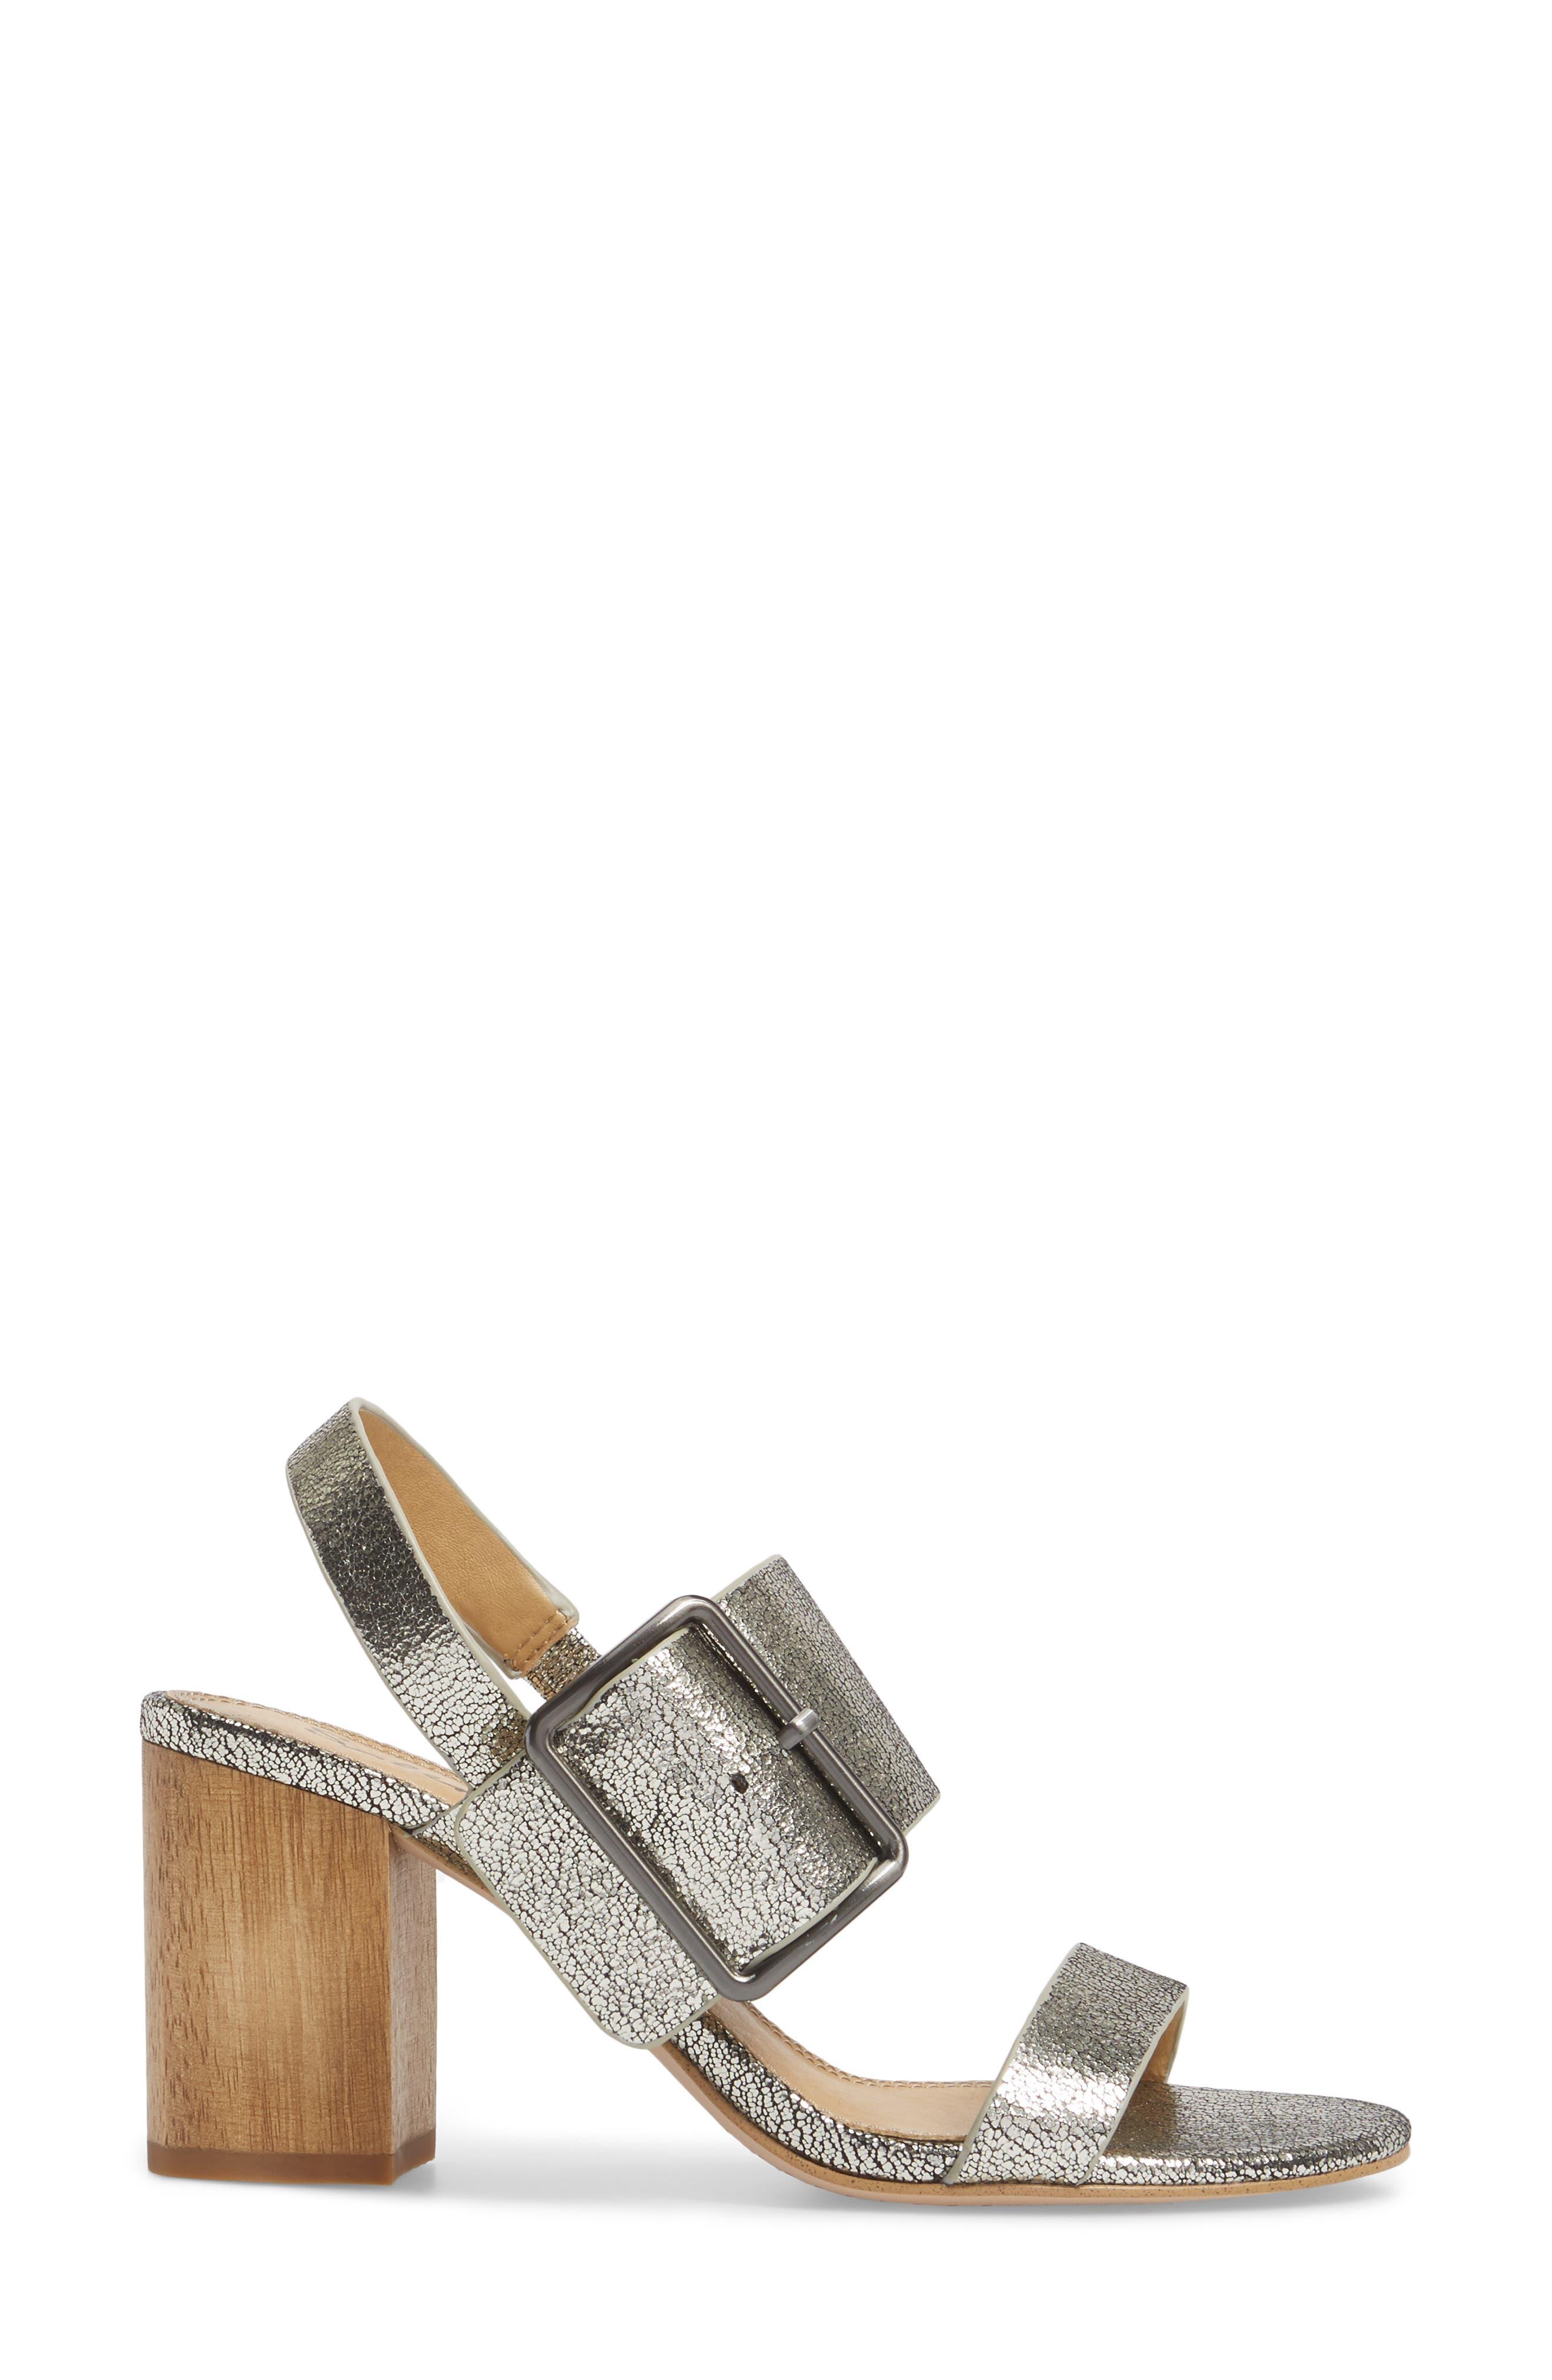 Bo Slingback Sandal,                             Alternate thumbnail 3, color,                             Nickel Metallic Leather